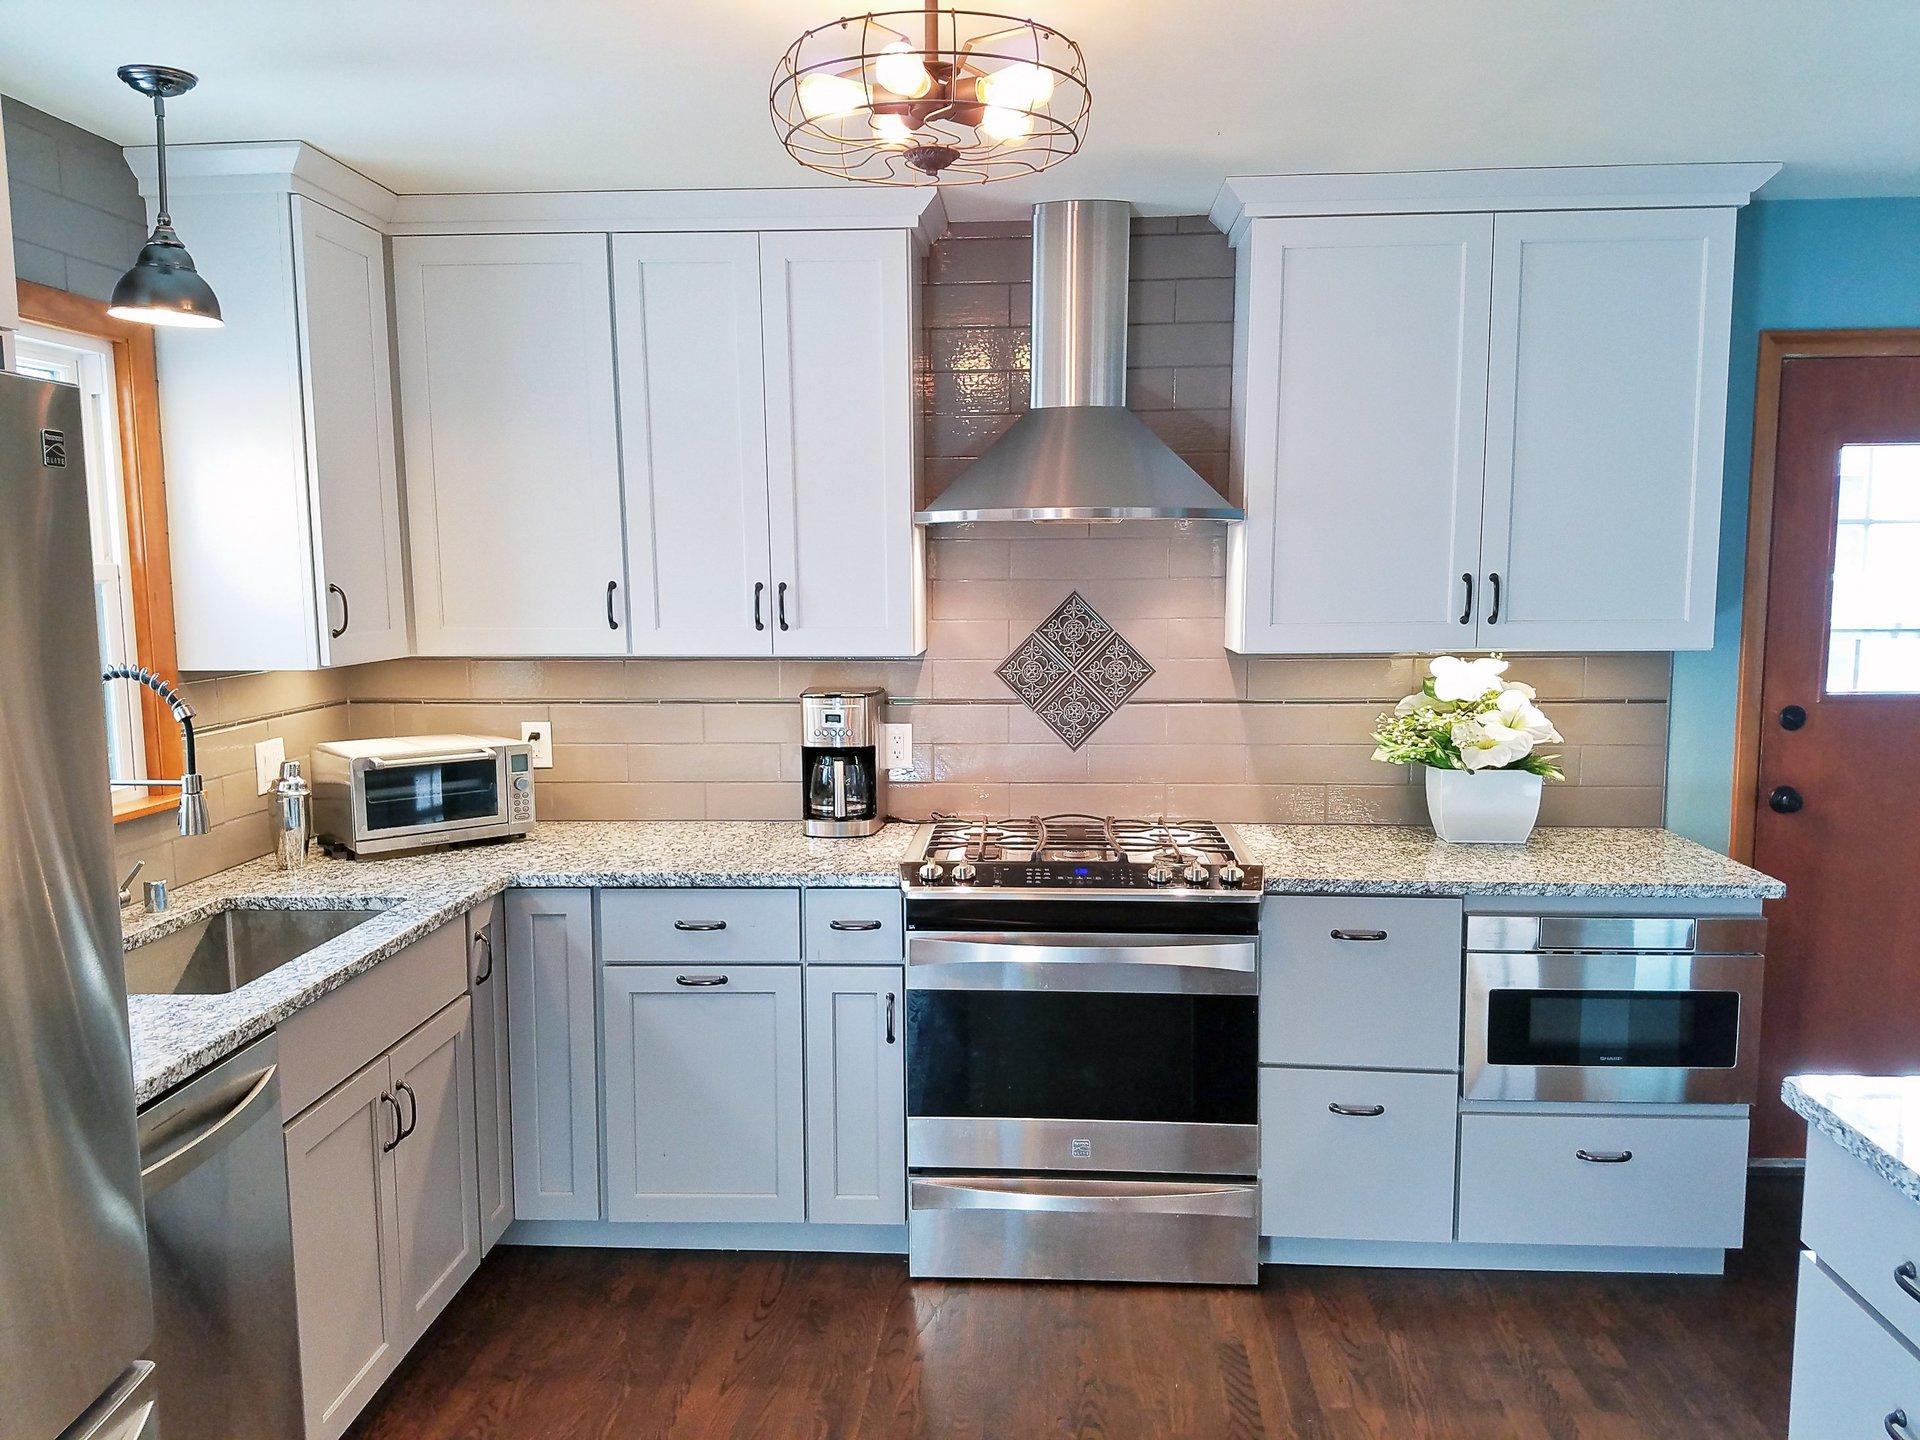 white cabinets, subway tile backsplash, kitchen, grey granite countertop